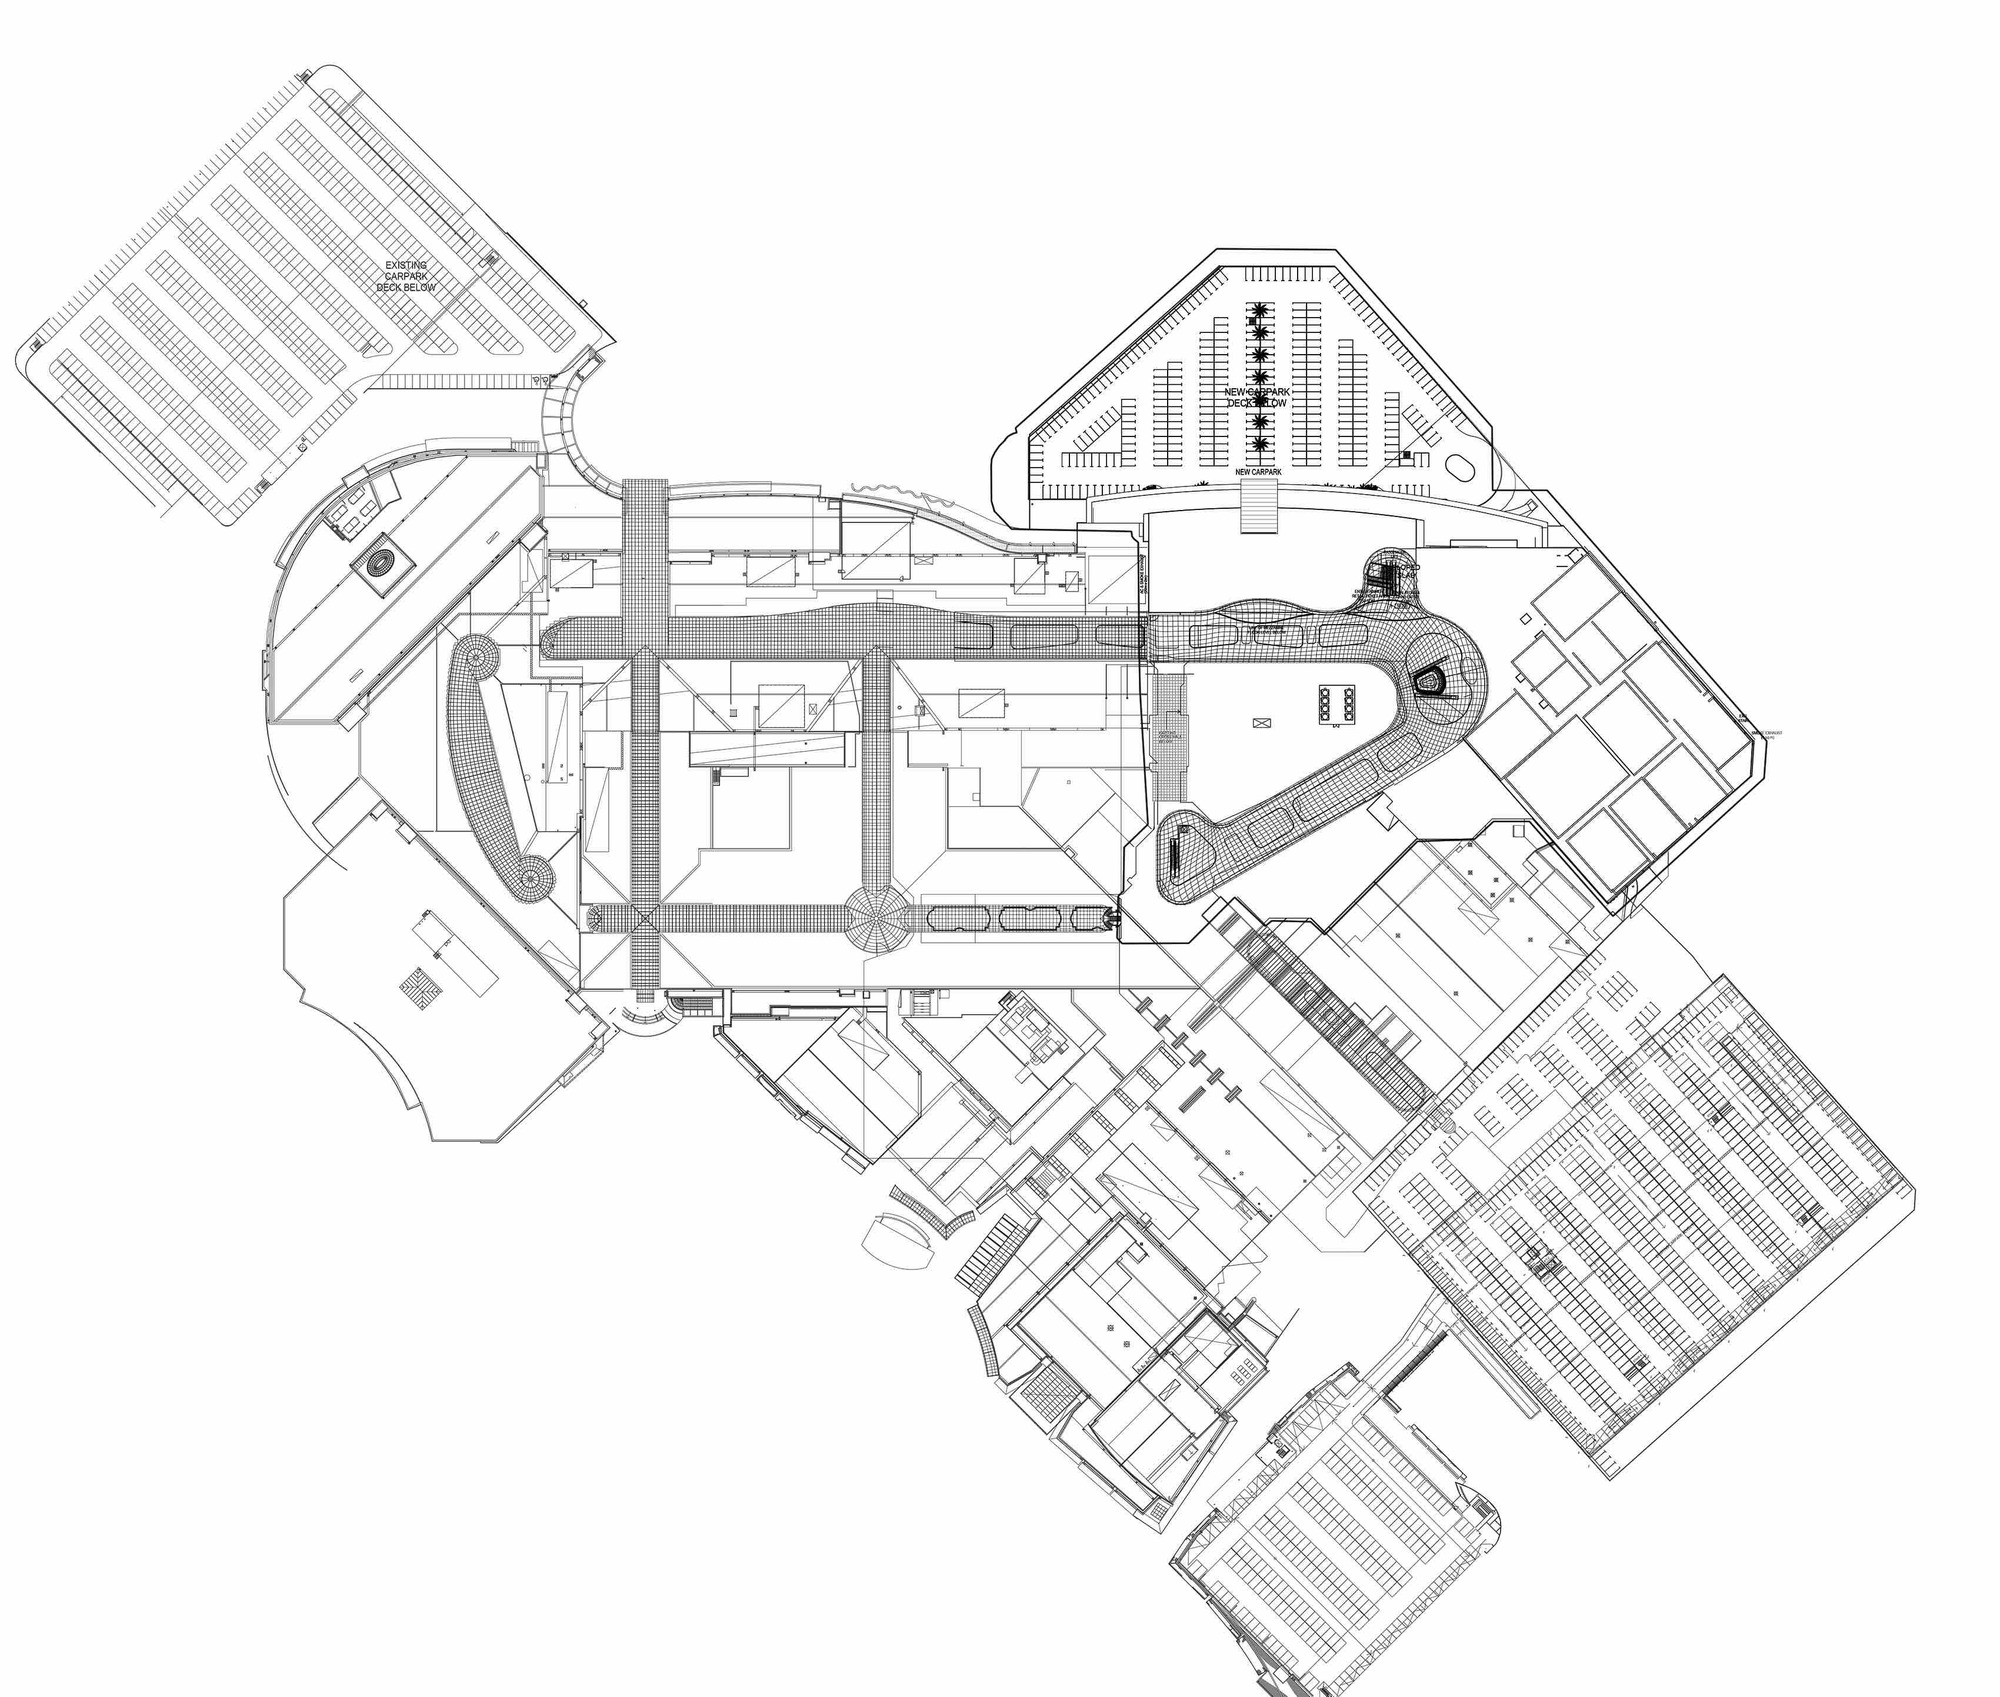 2000x1697 Gallery Of Chadstone Shopping Centre Callisonrtkl + The Buchan